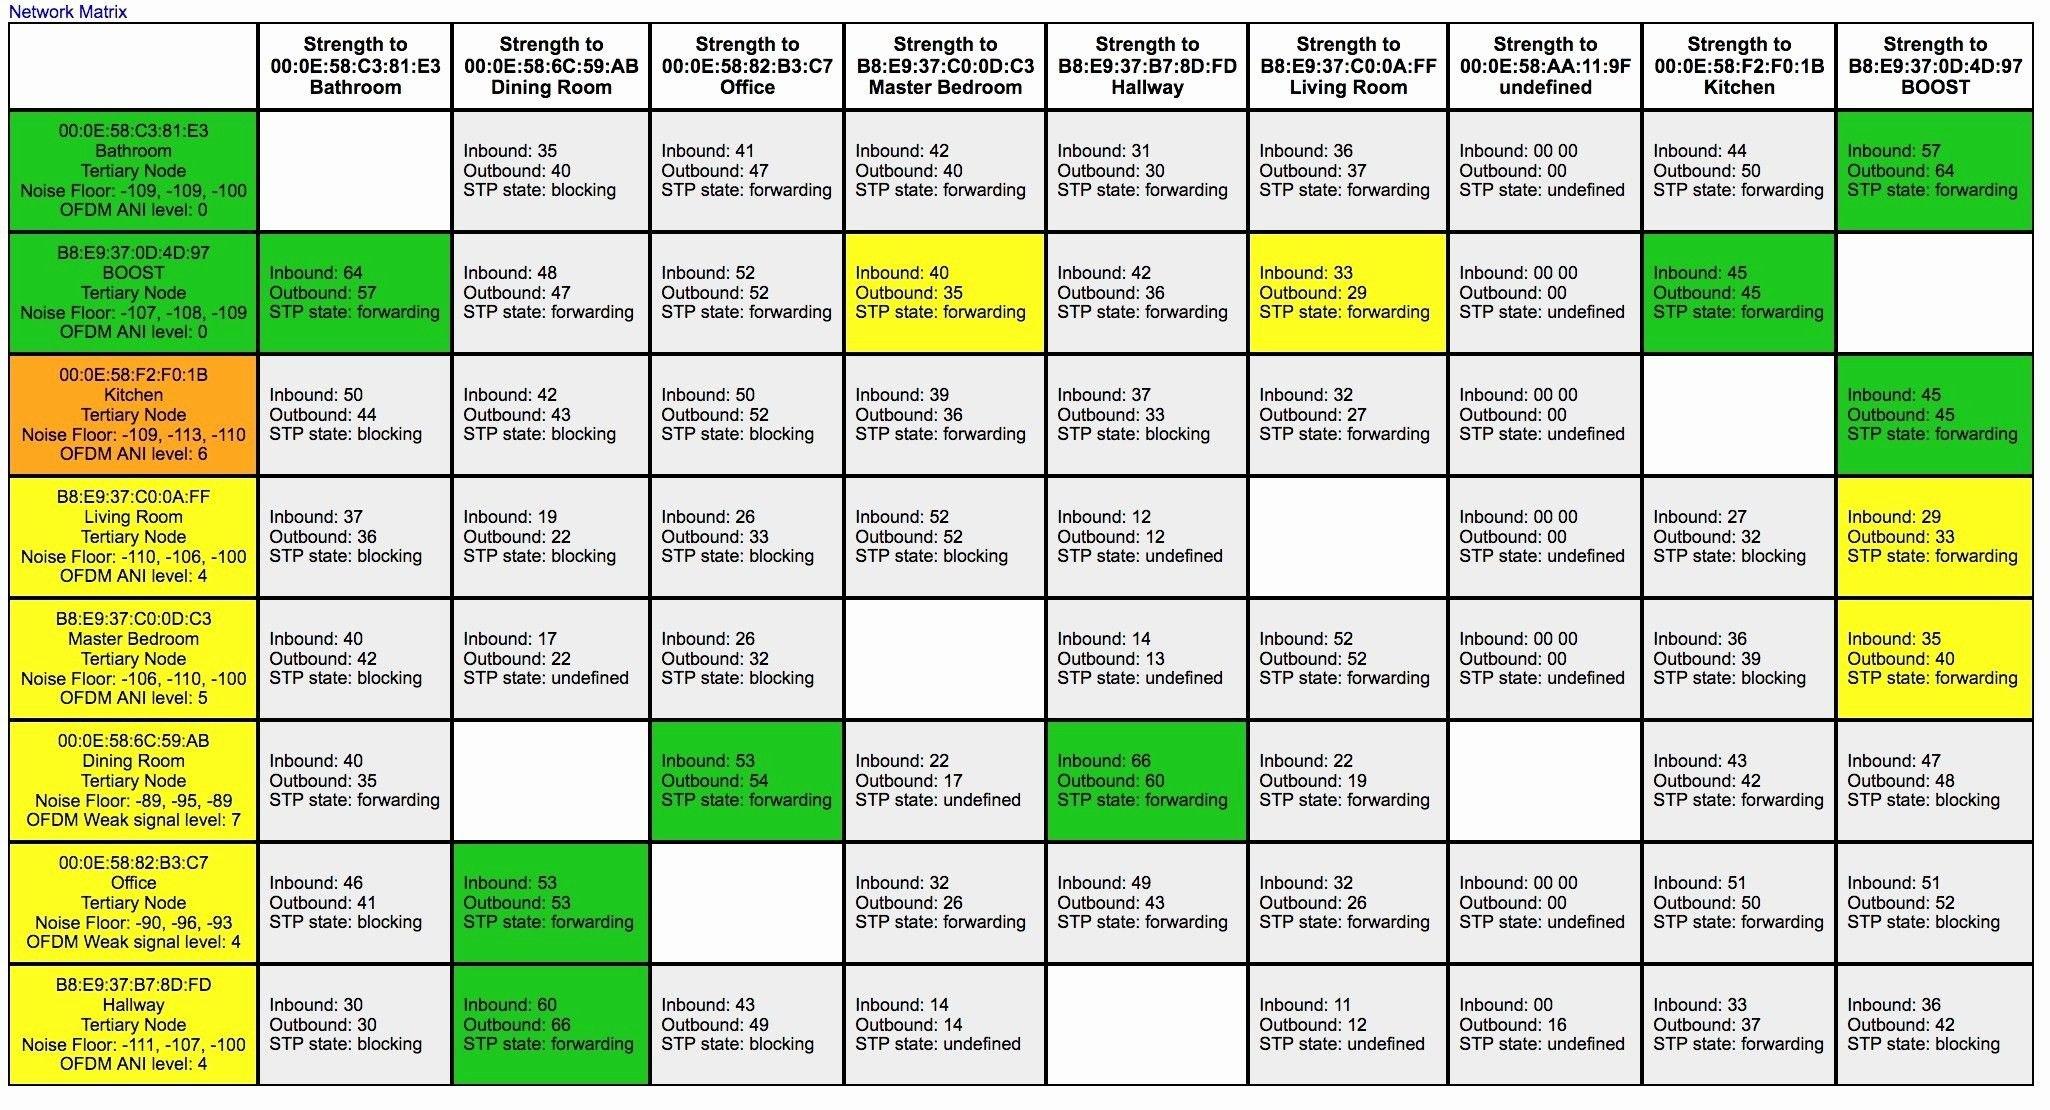 Soc  Report Example  Glendale Community Regarding Pci Dss Gap Analysis Report Template